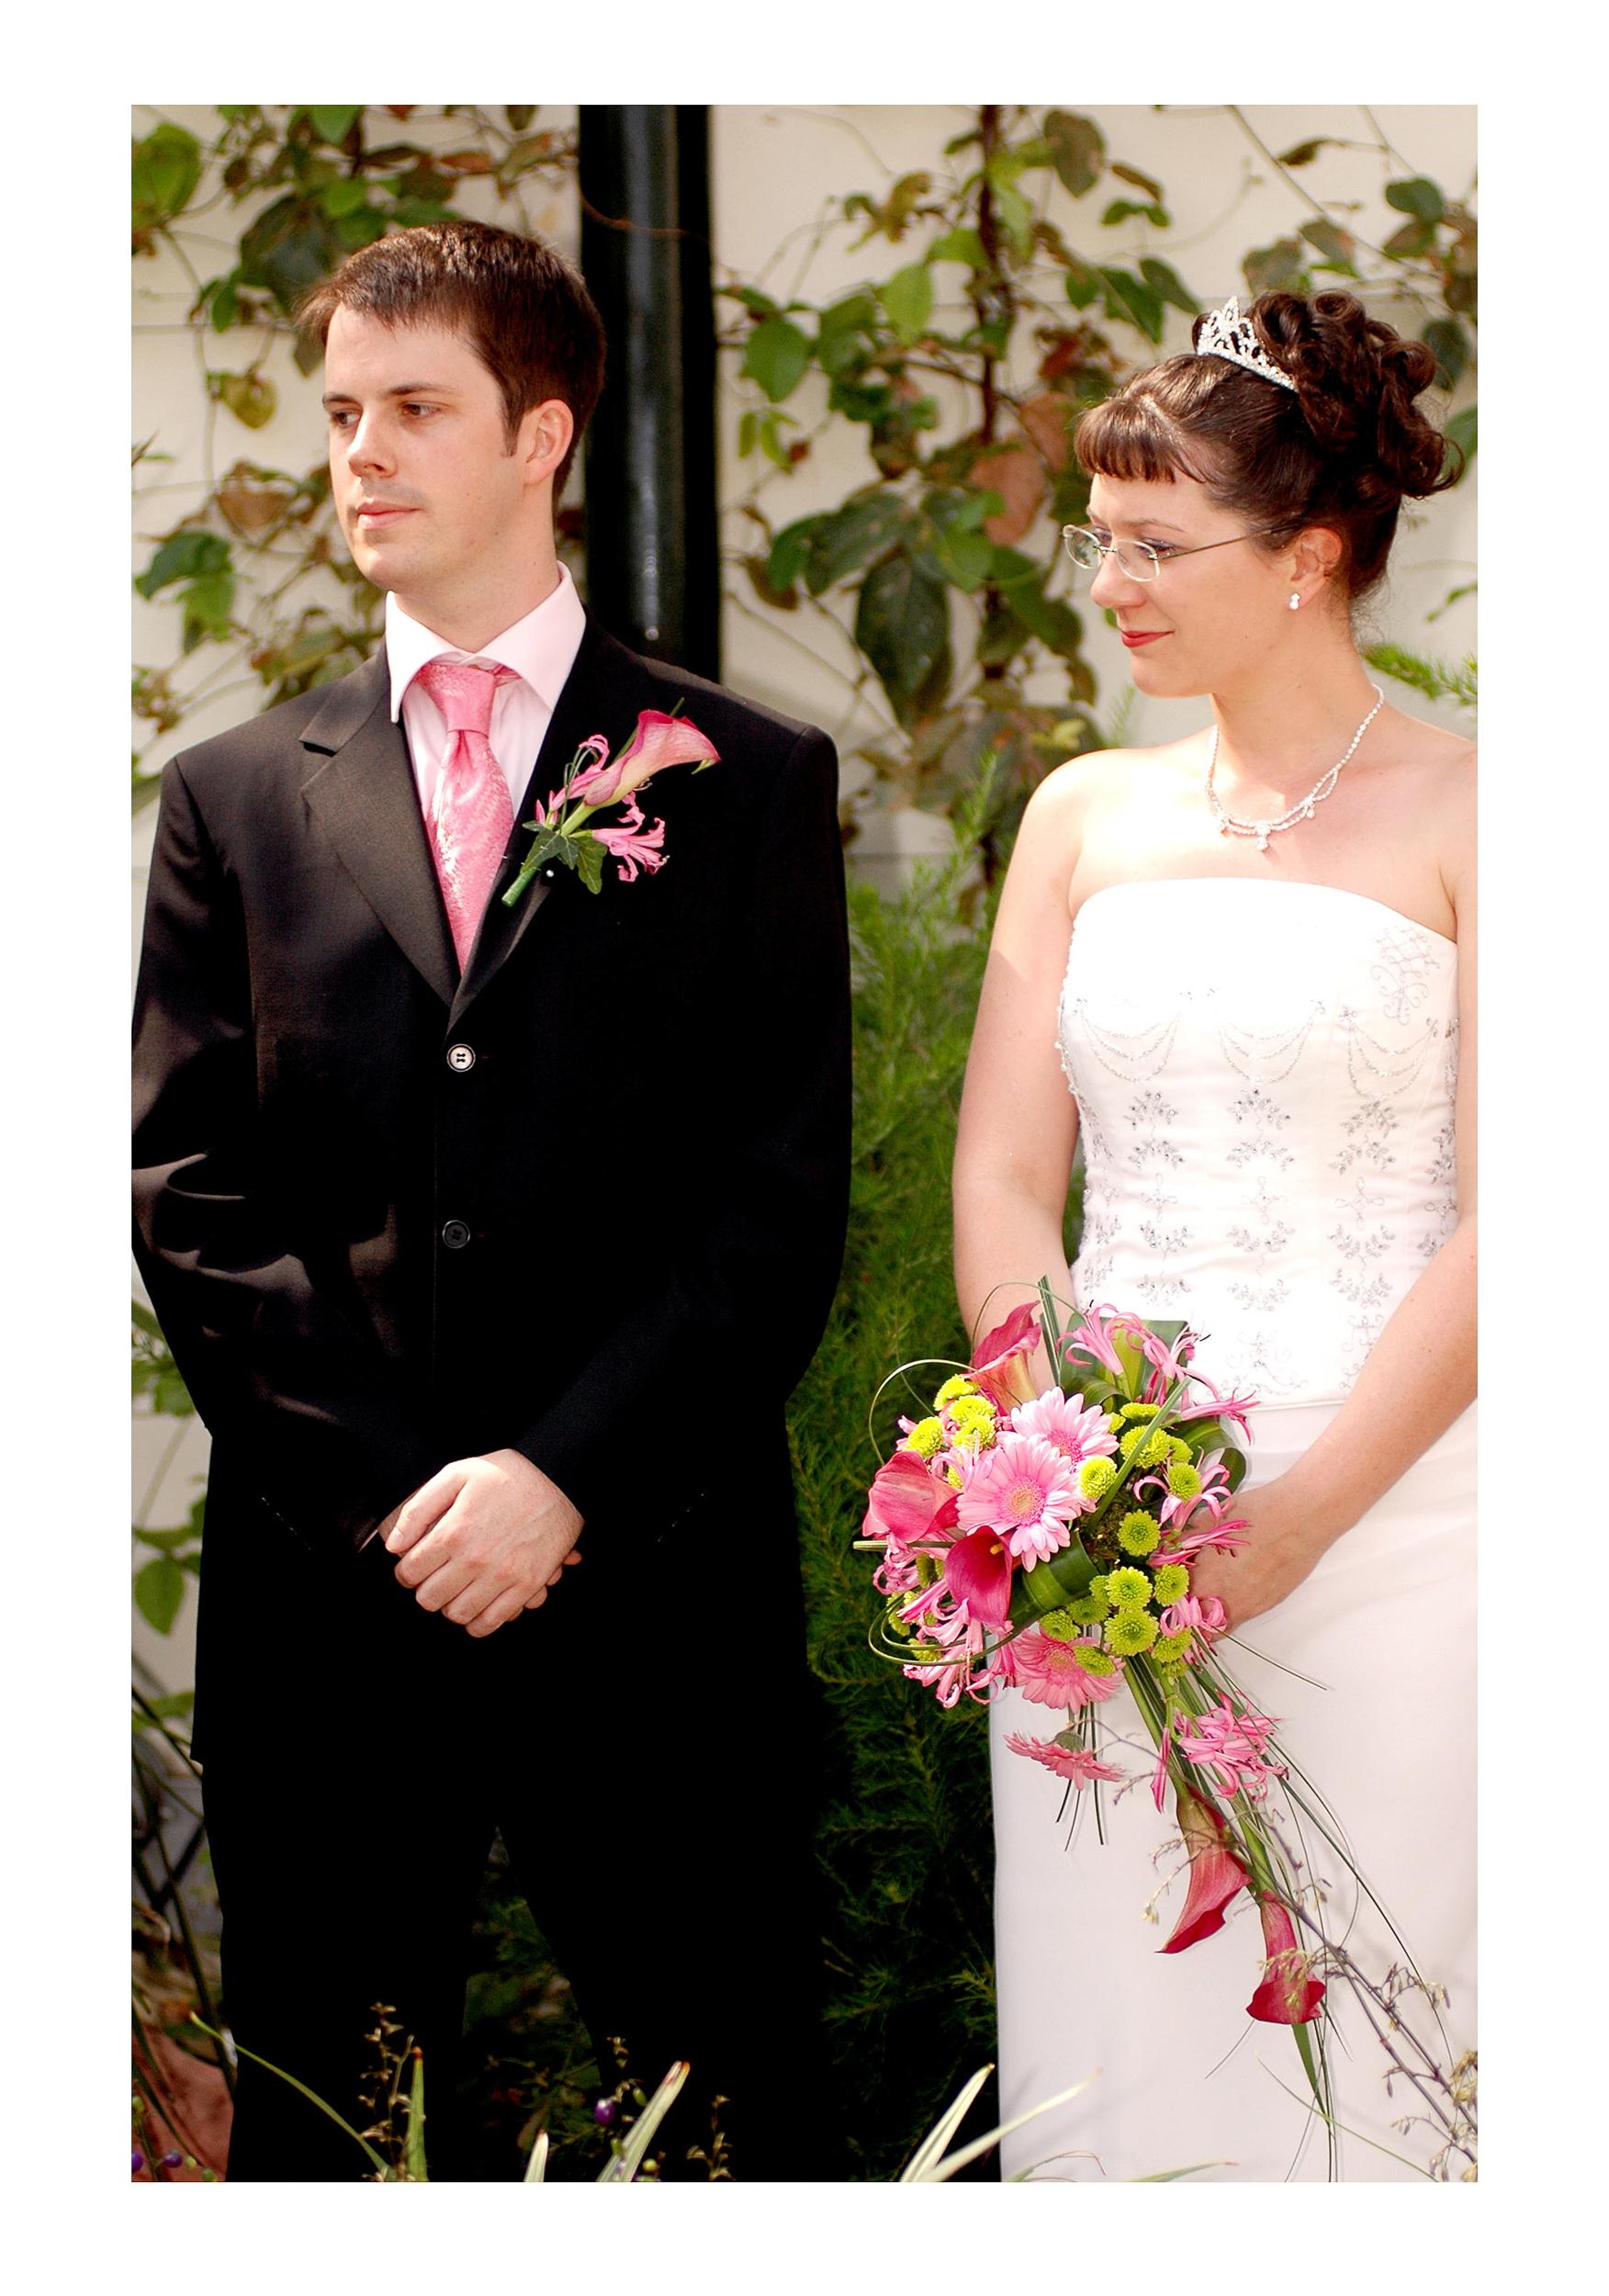 REPORTAGE-WEDDING-PHOTOGRAPHY-SET-UK-9.jpg